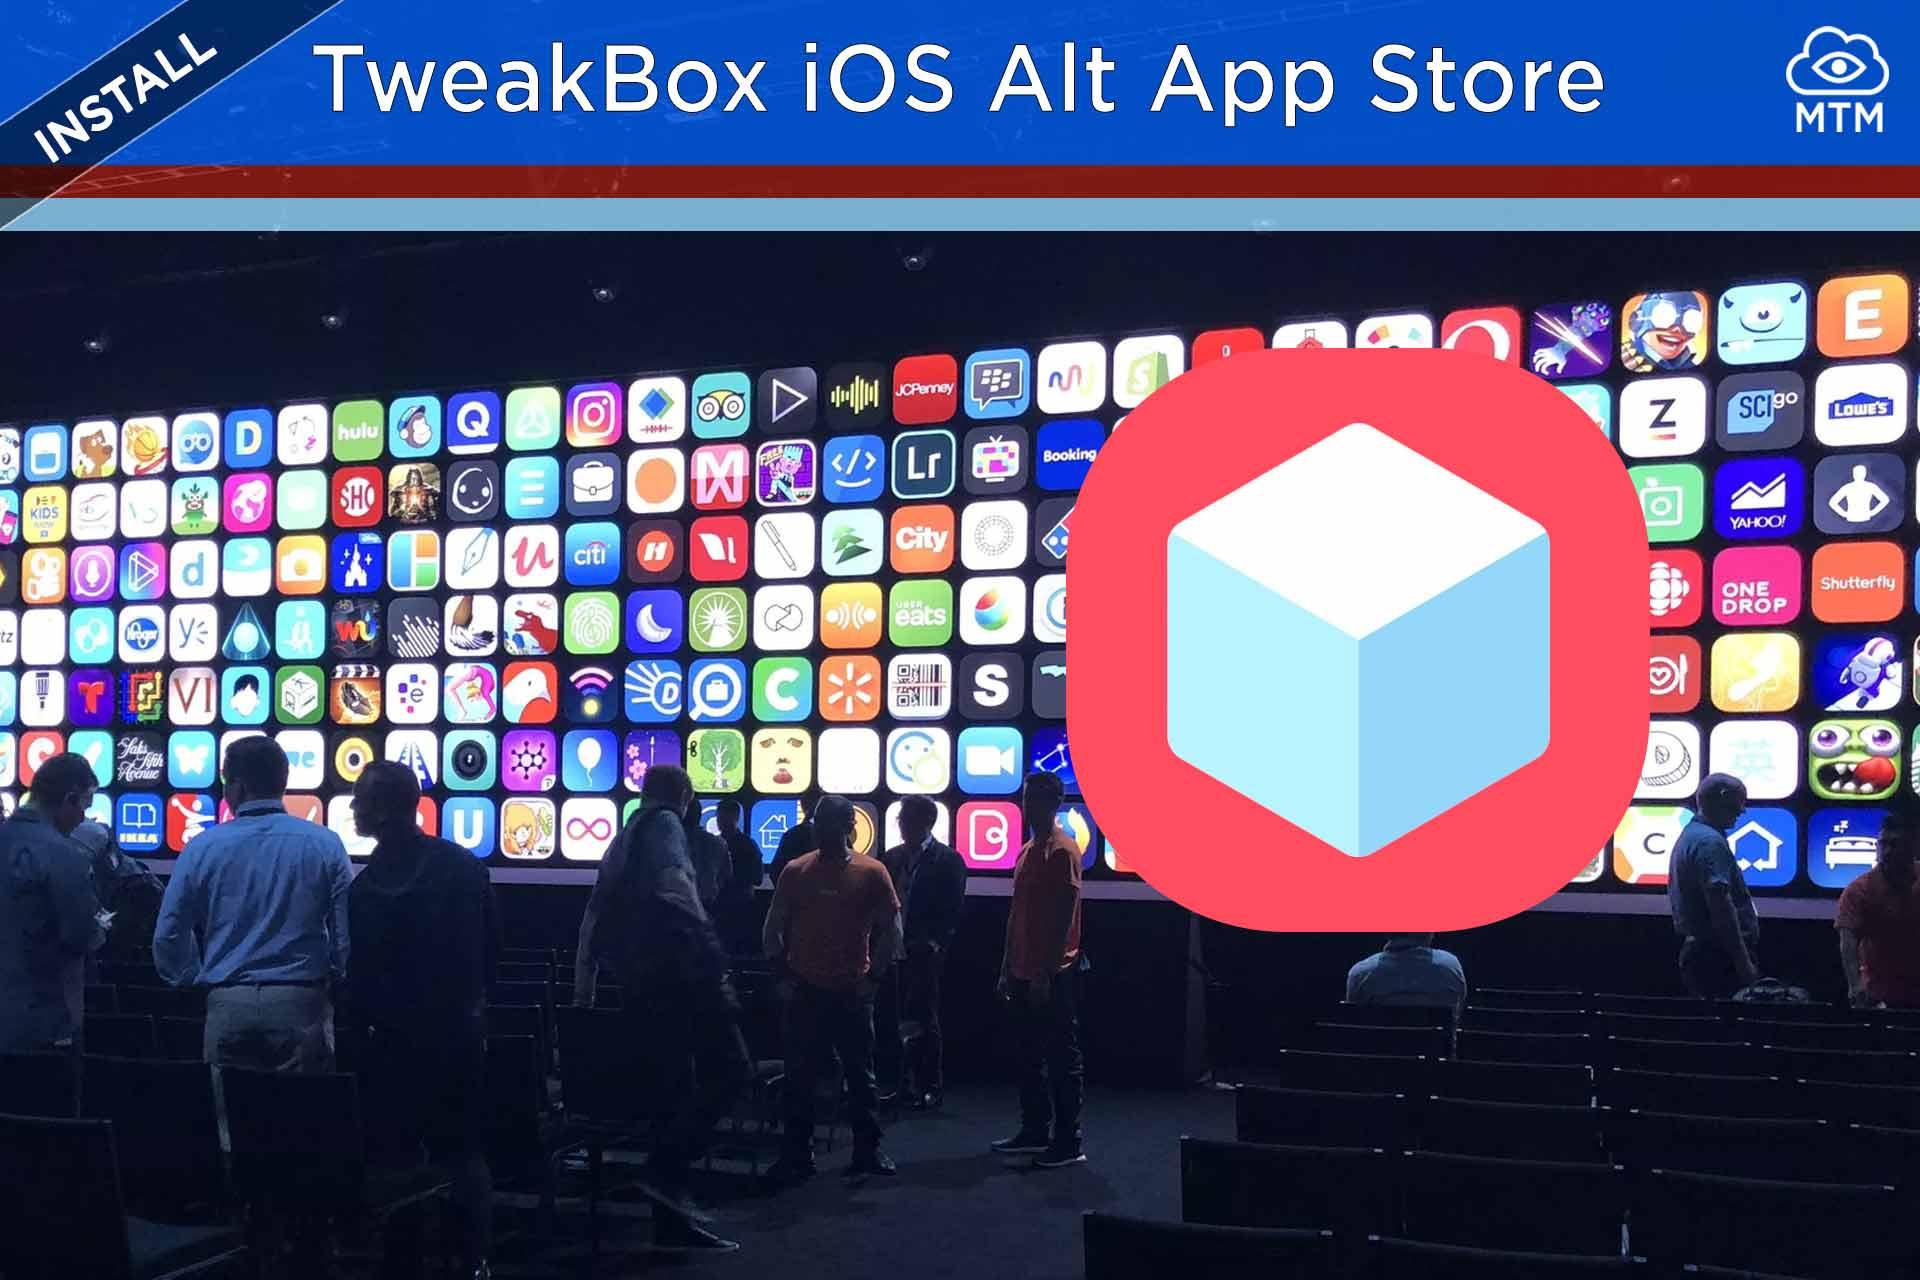 Download TweakBox Android APK iOS & Install on iPad, iPod, iPhone